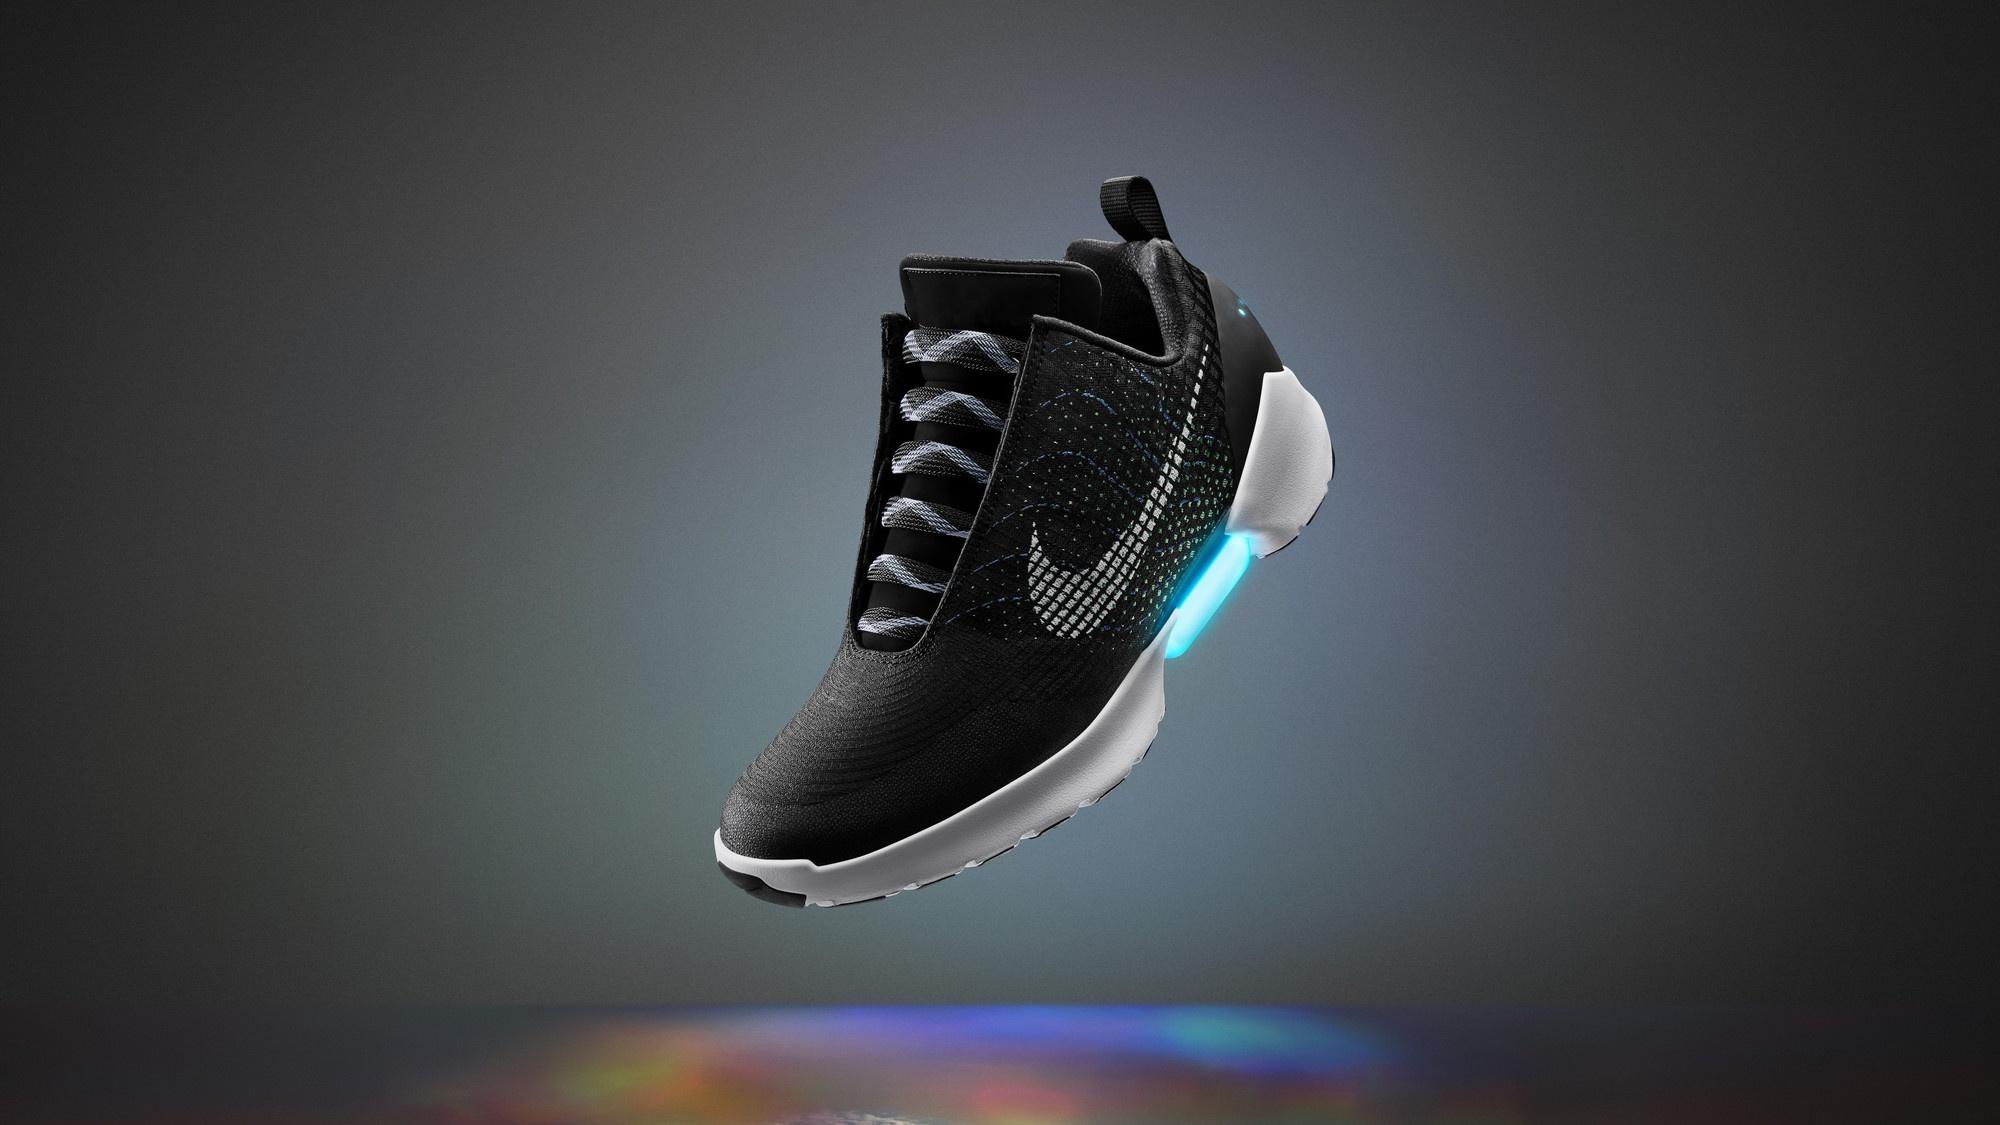 3b55d8af7328fb Nike has unveiled a futuristic